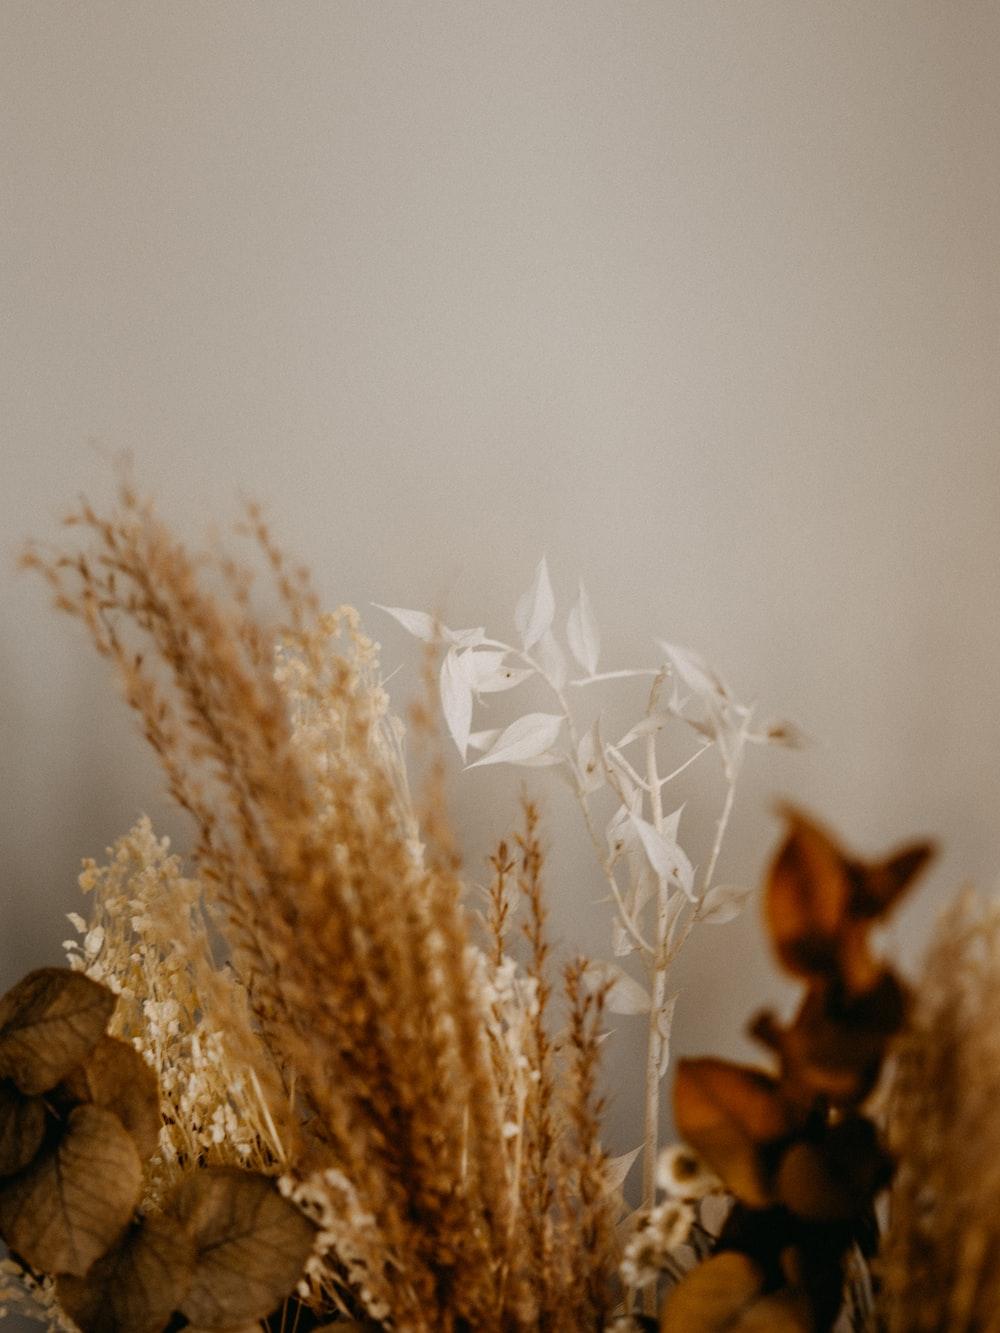 white flower on brown rock